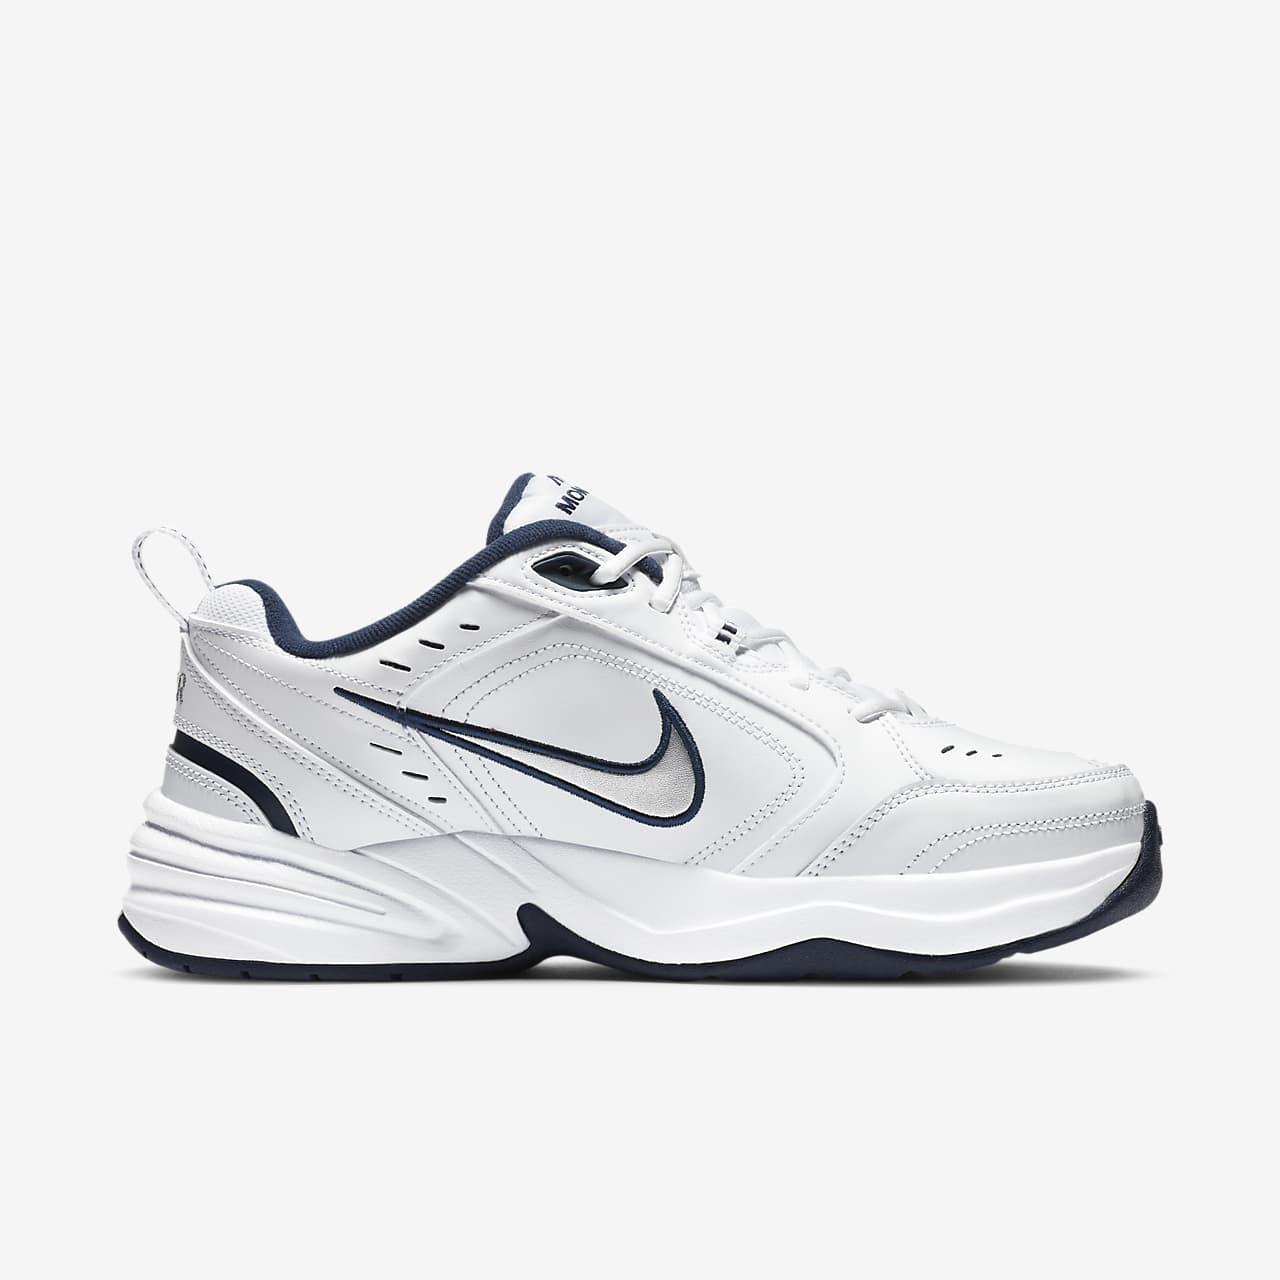 ... Nike Air Monarch IV-unisex-træningssko